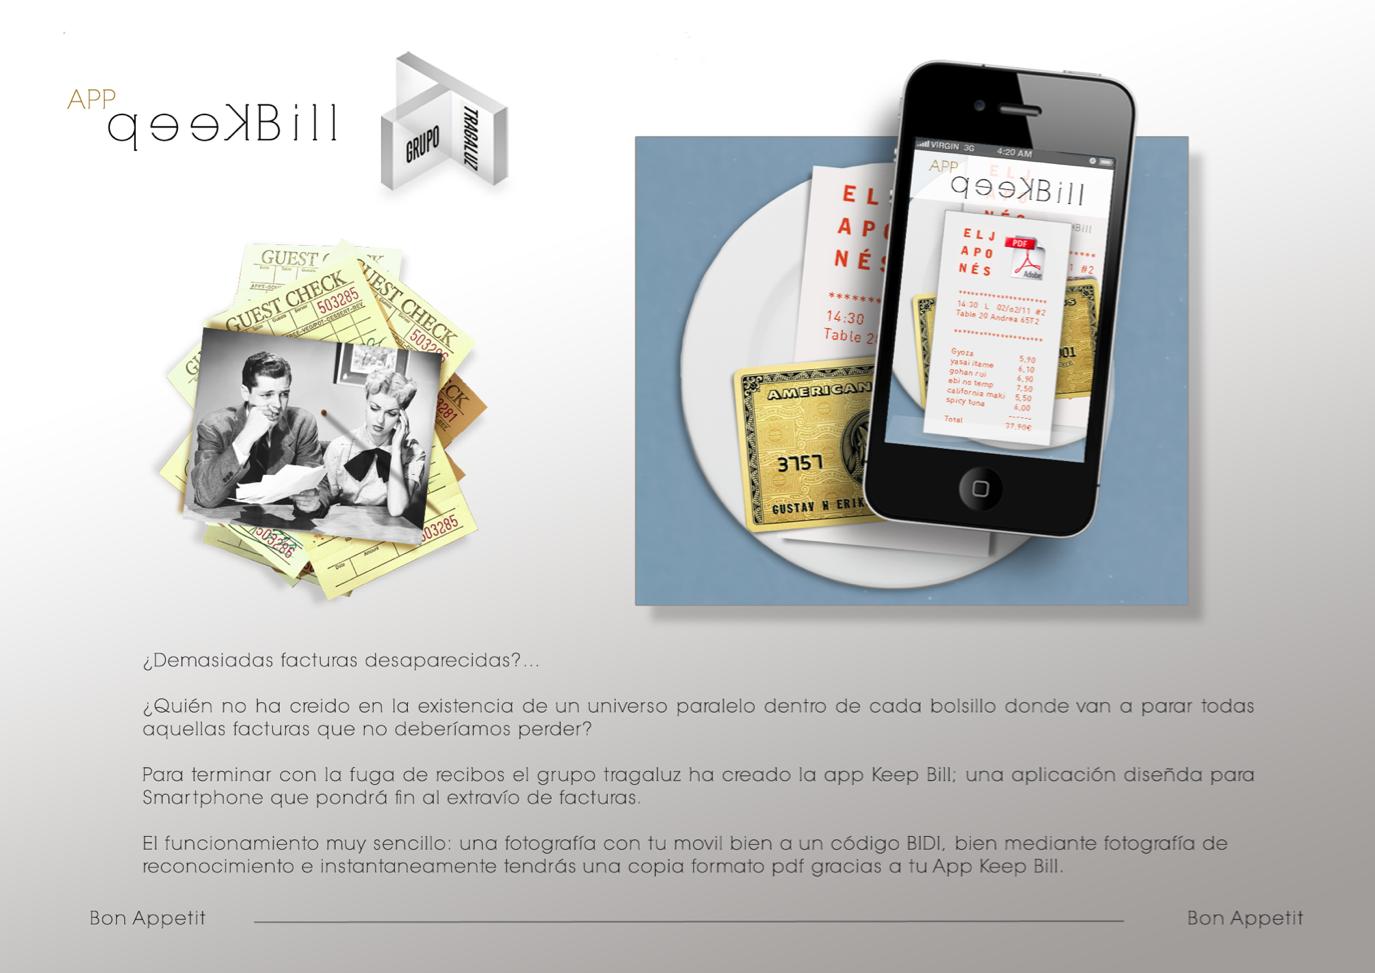 App keep bill (tragaluz)